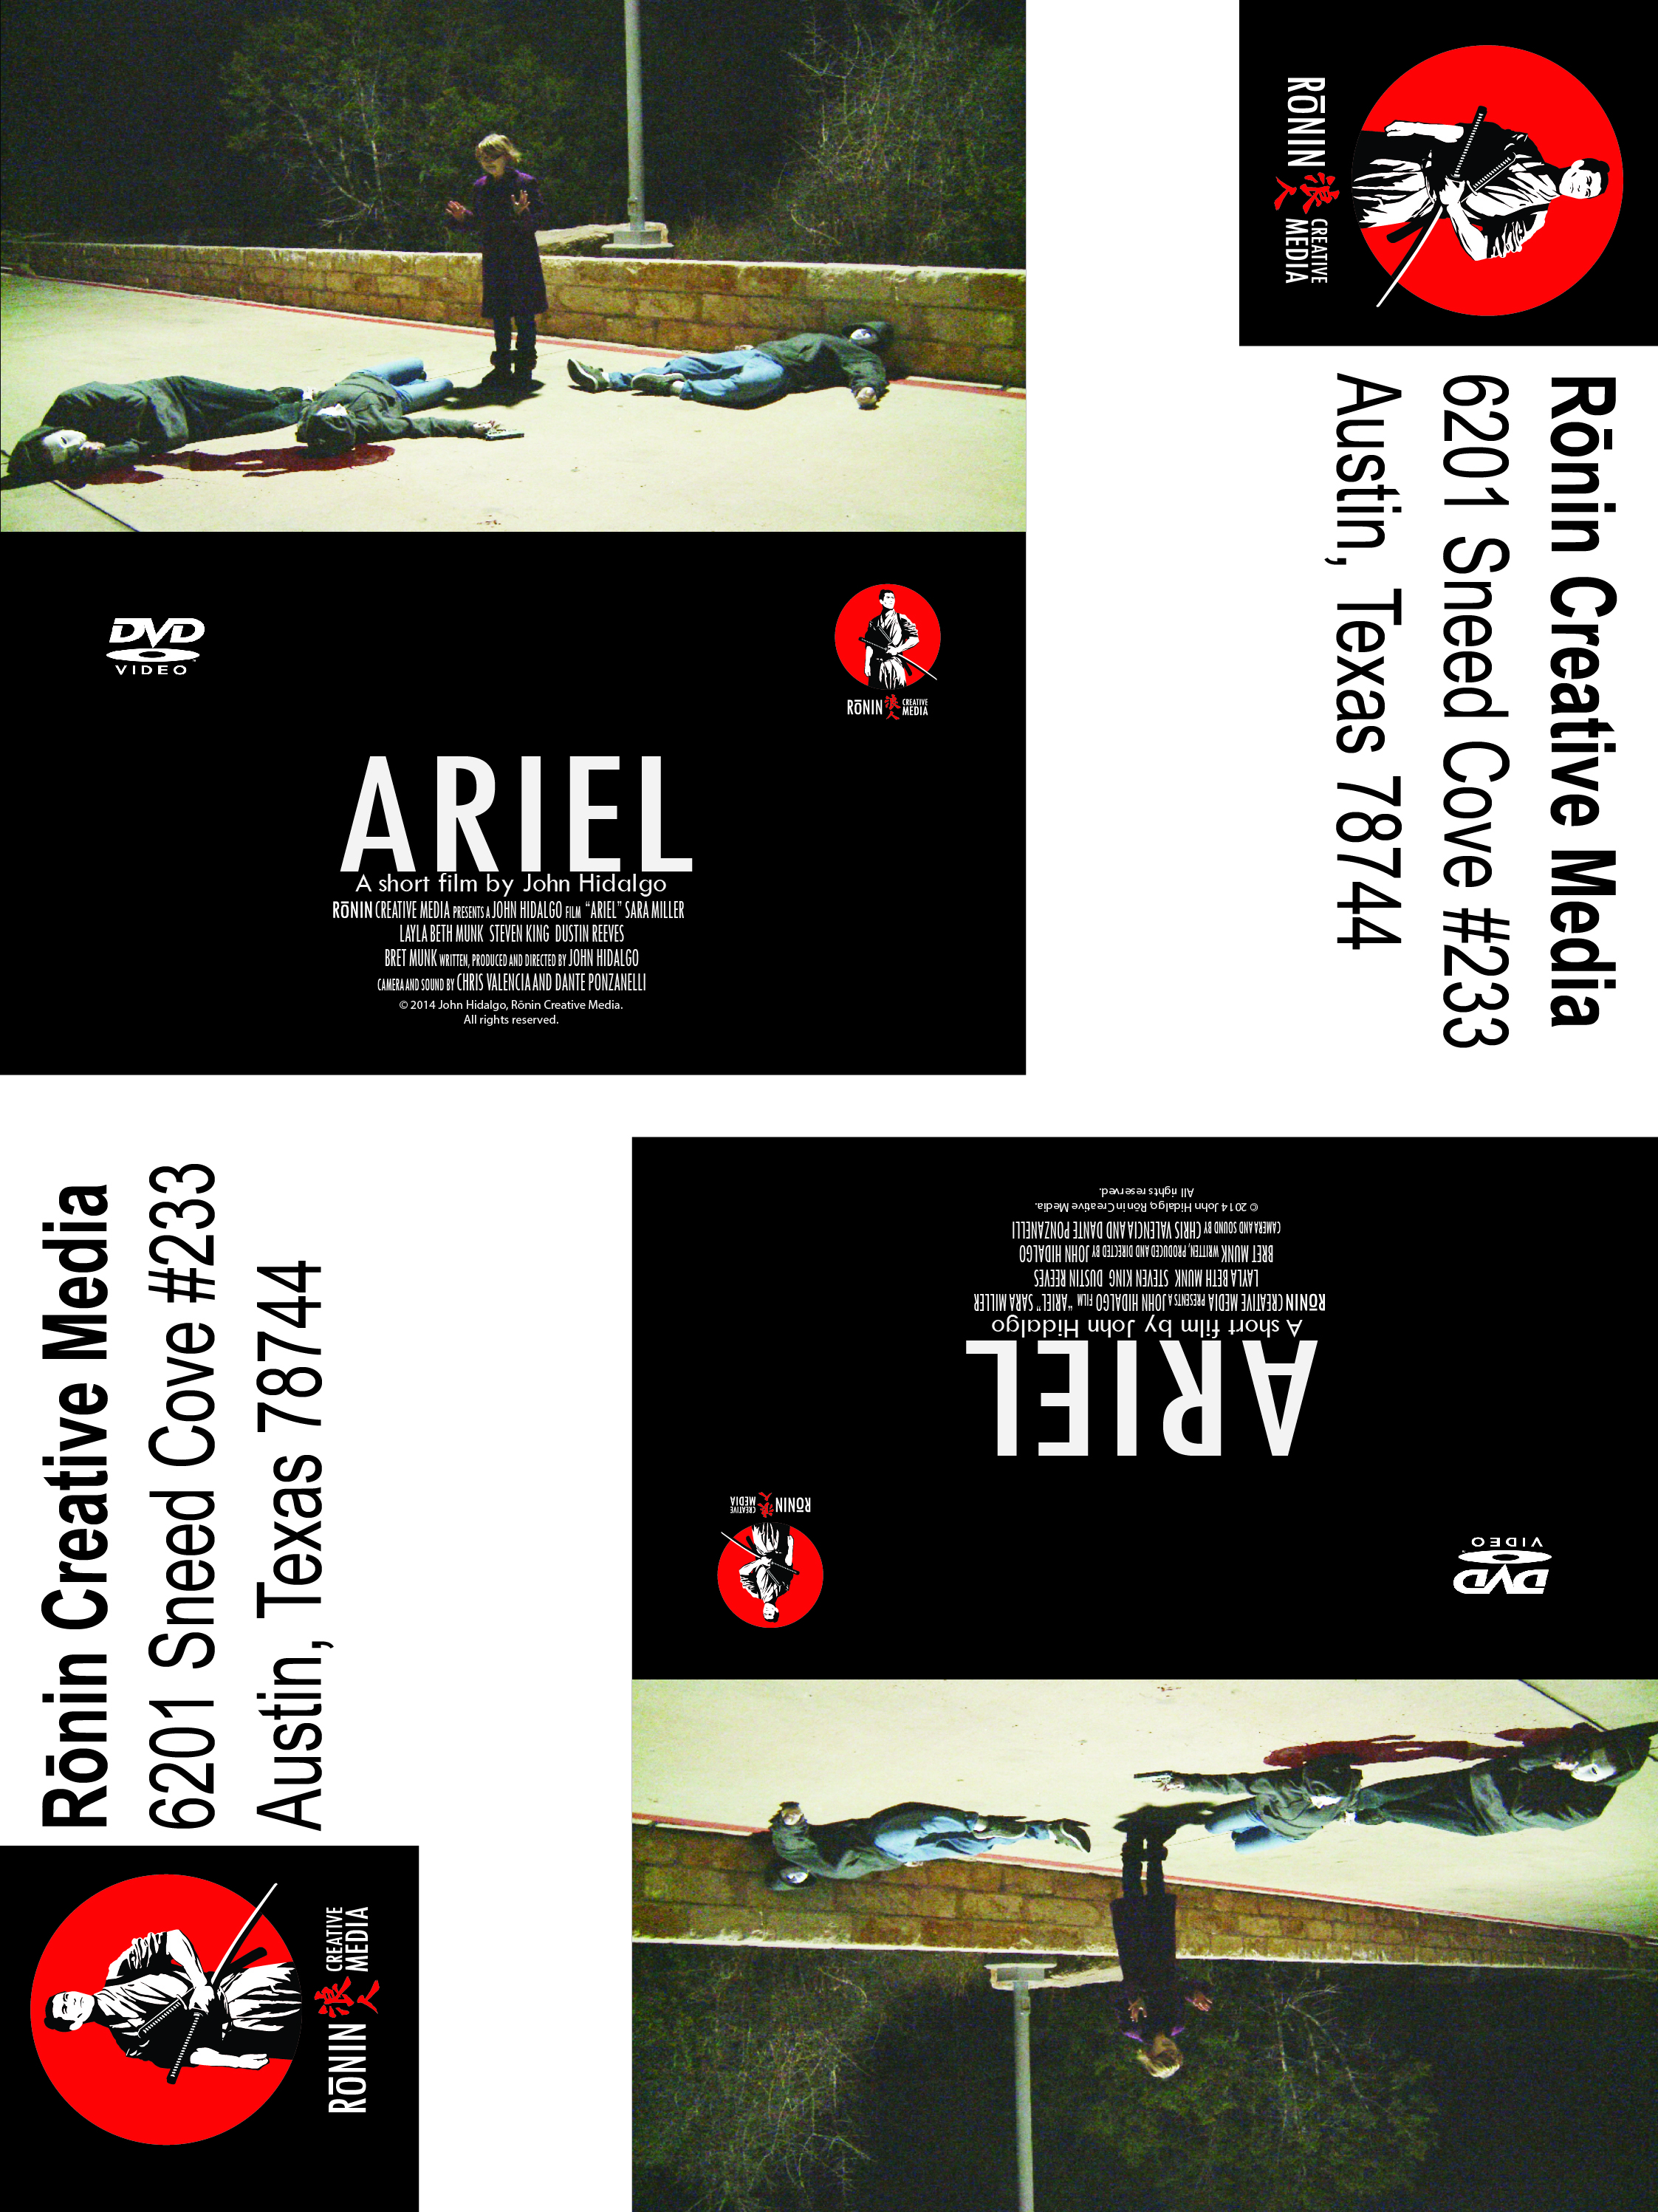 Ariel Label